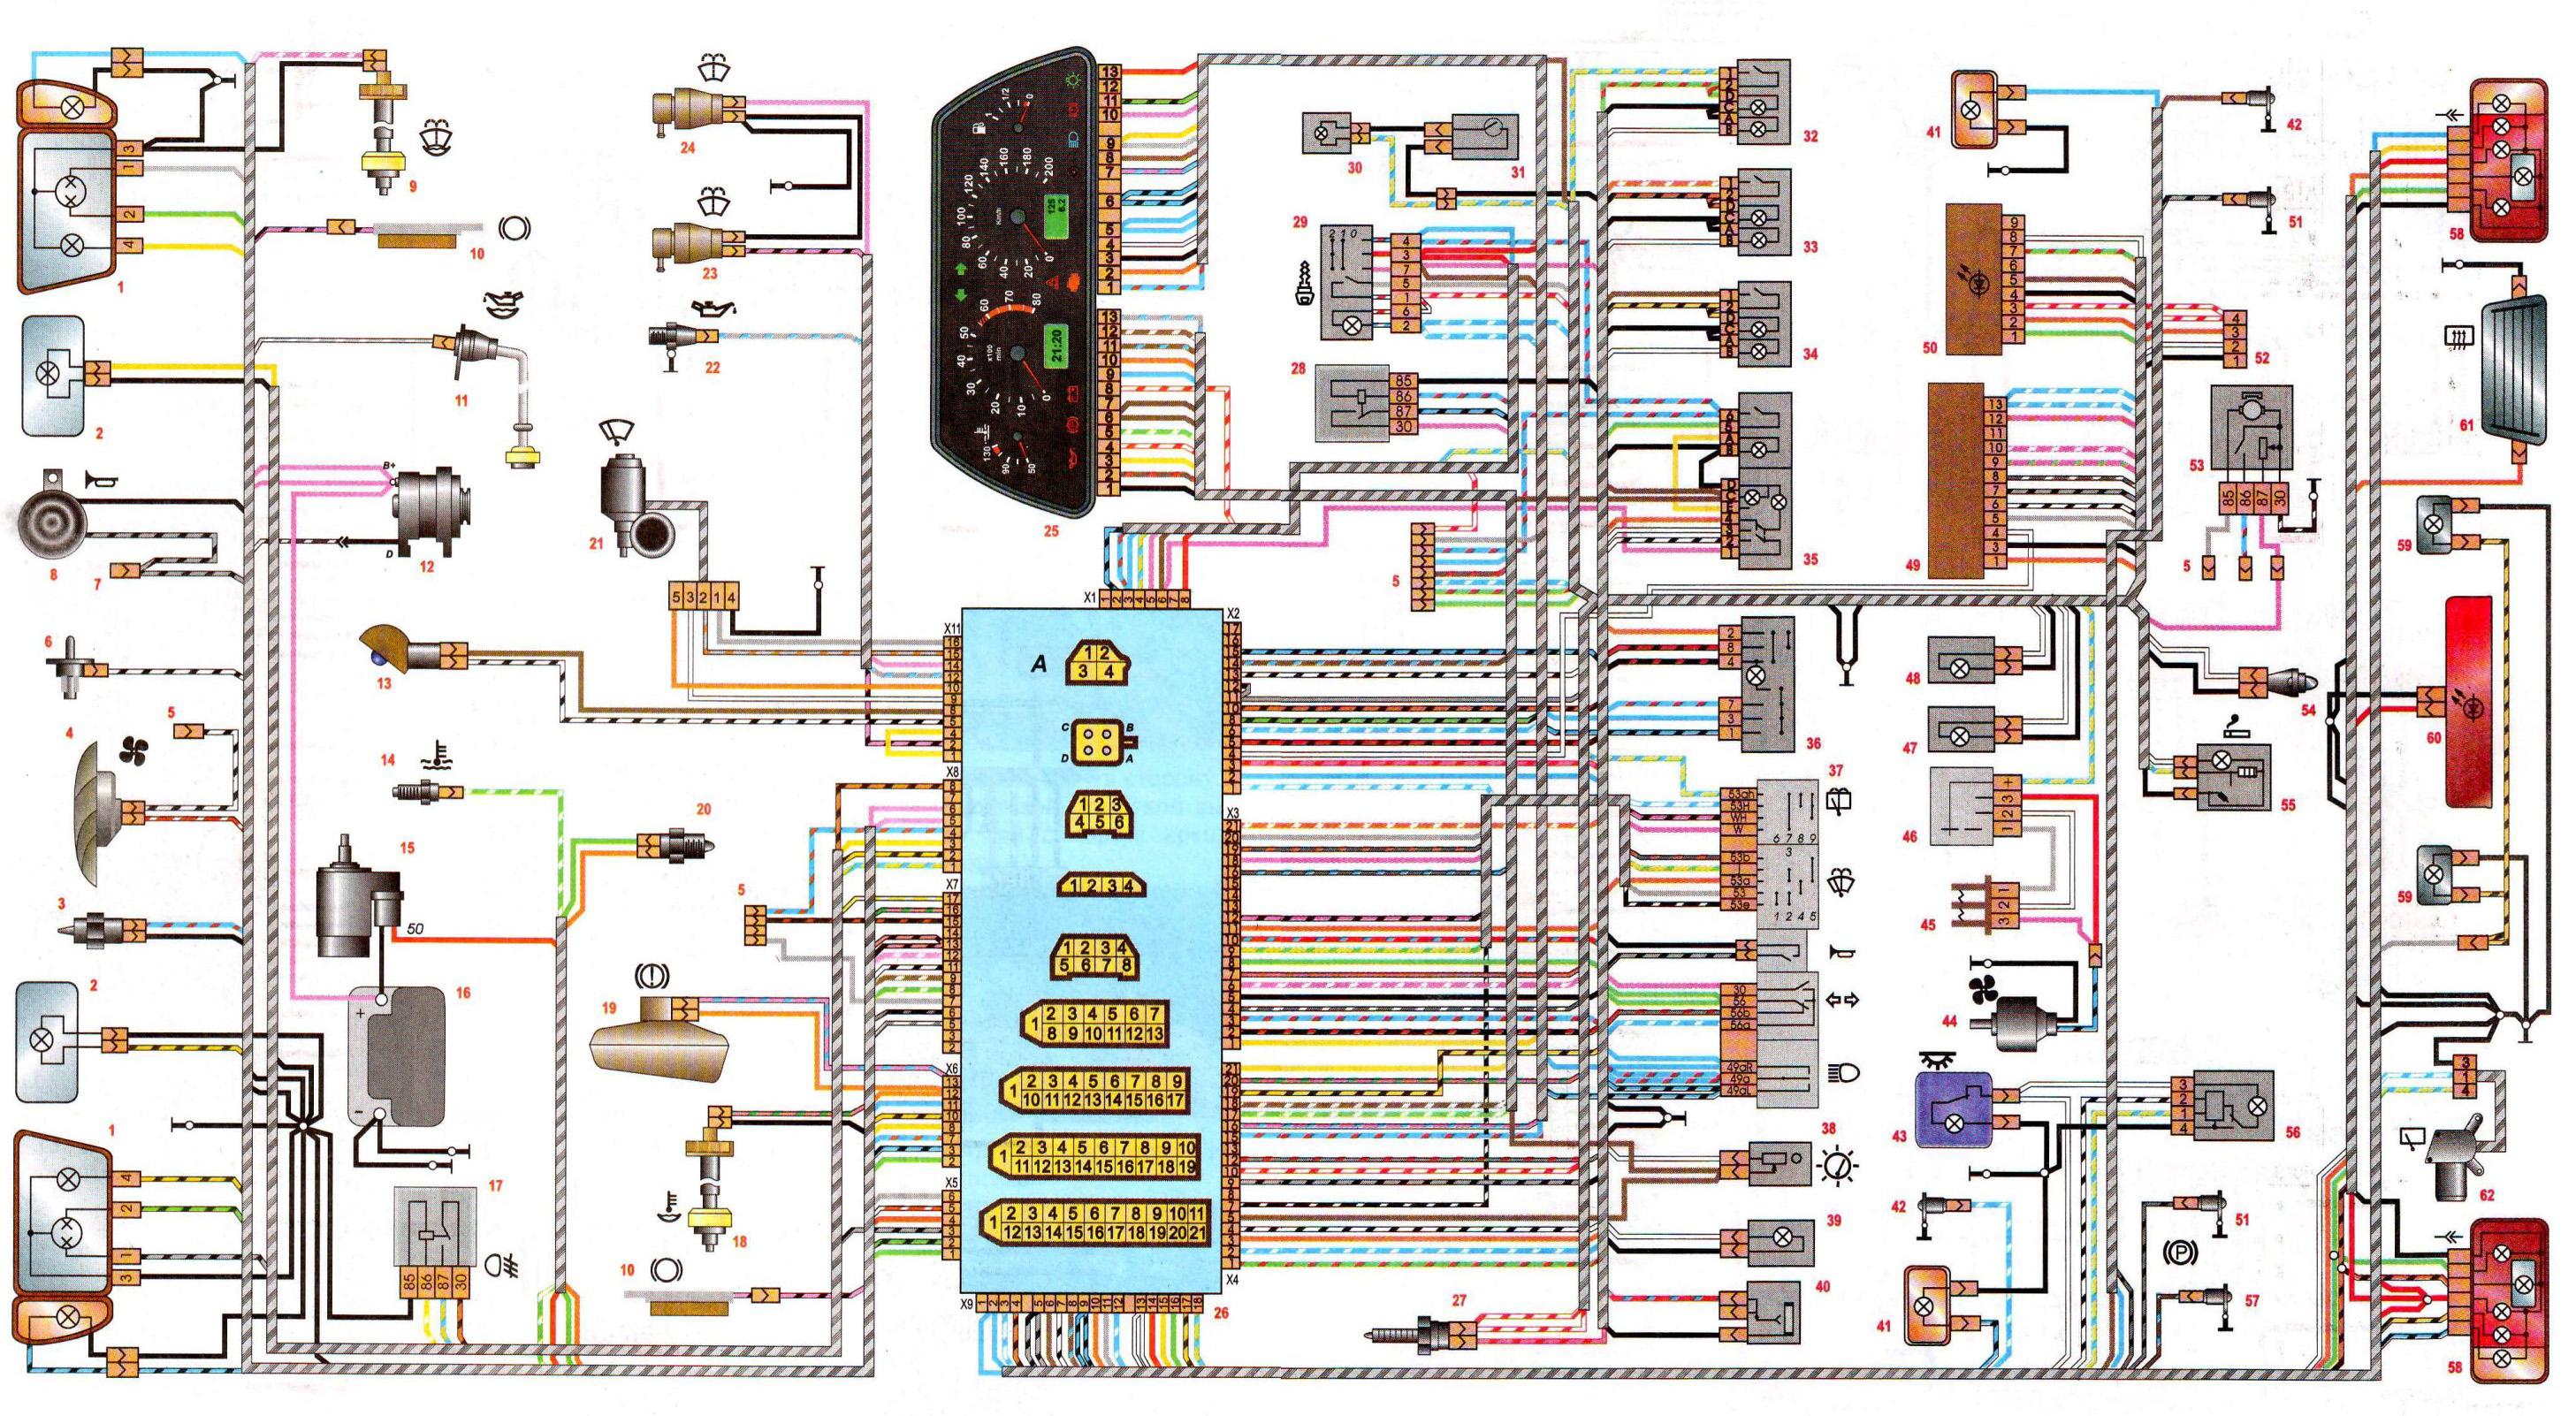 Схема электрооборудования ваз 2114 инжектора